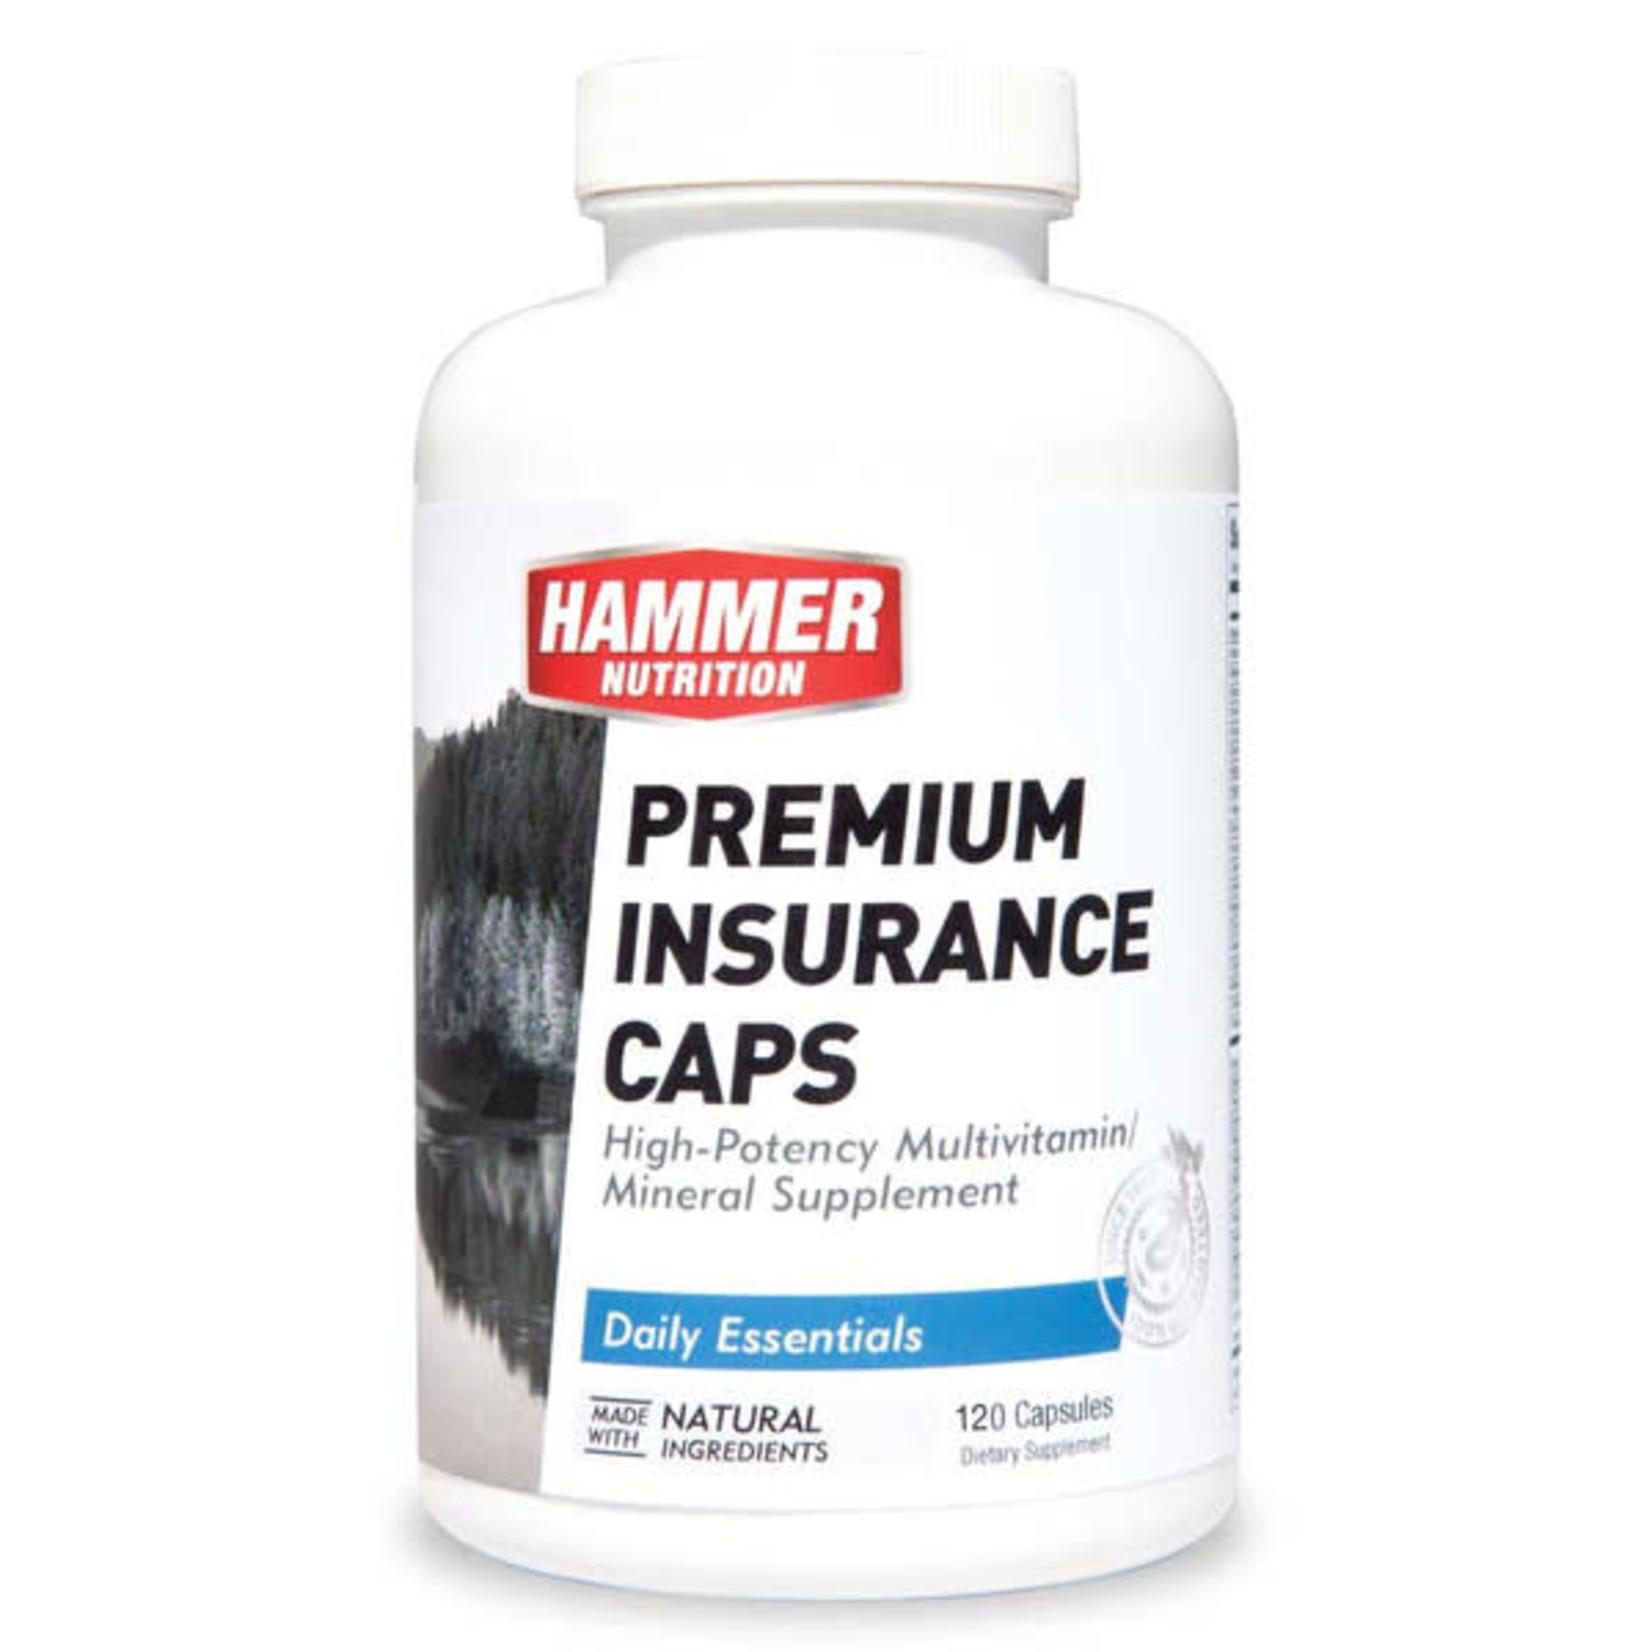 Hammer Nutrition Hammer Premium Insurance Caps 120ct